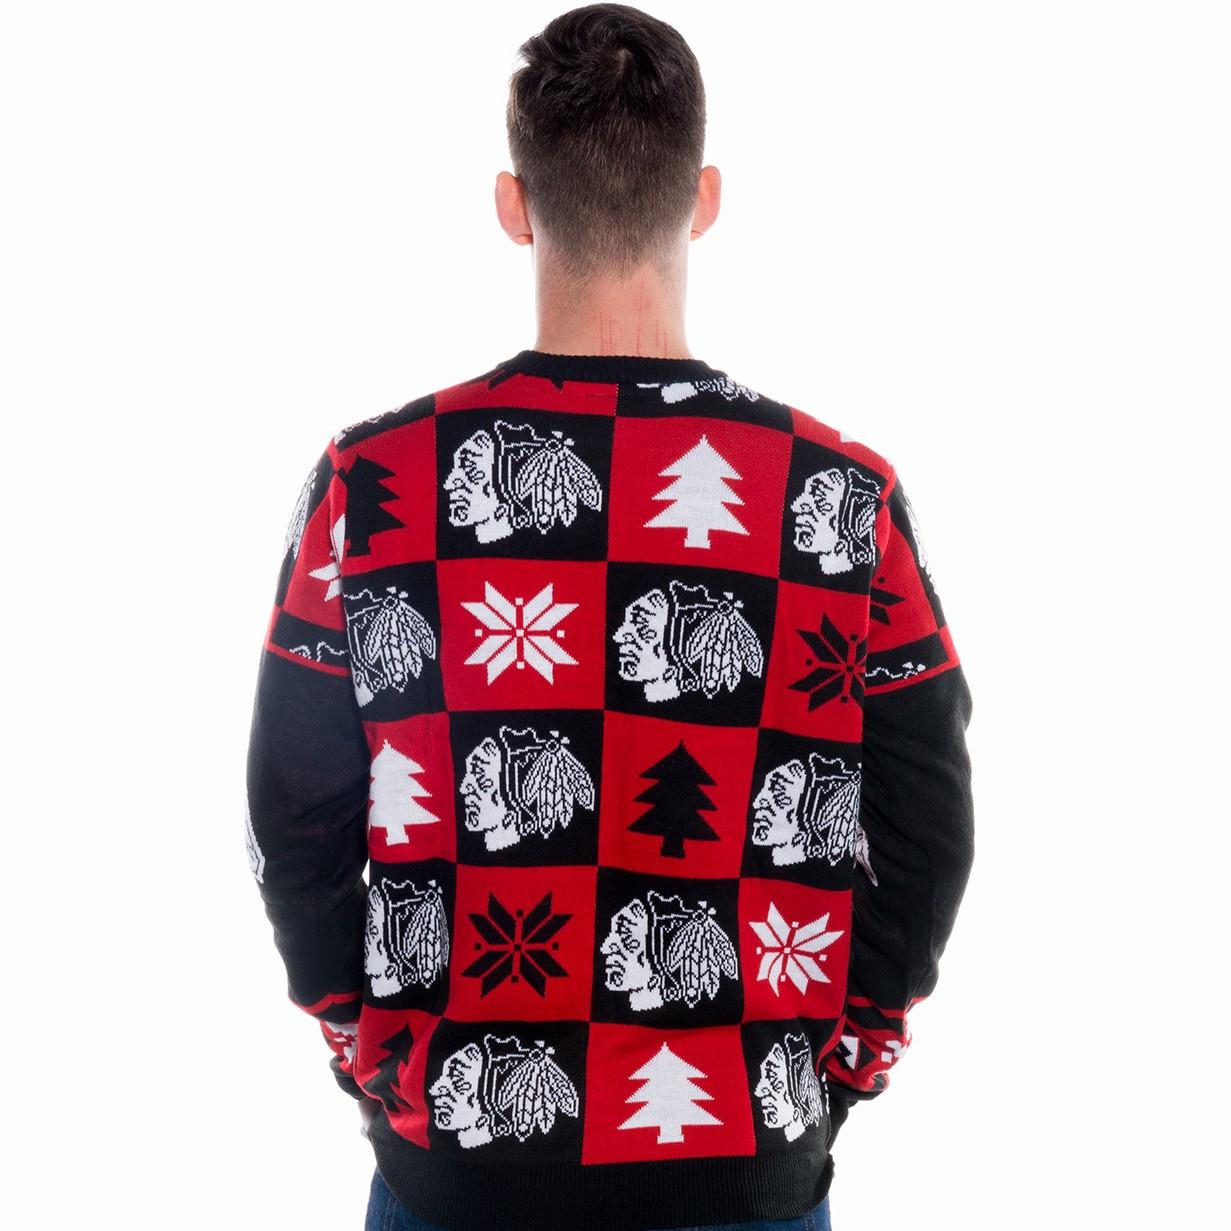 Chicago Blackhawks Ugly Christmas Sweater NHL 2017 | RetroFestive.ca